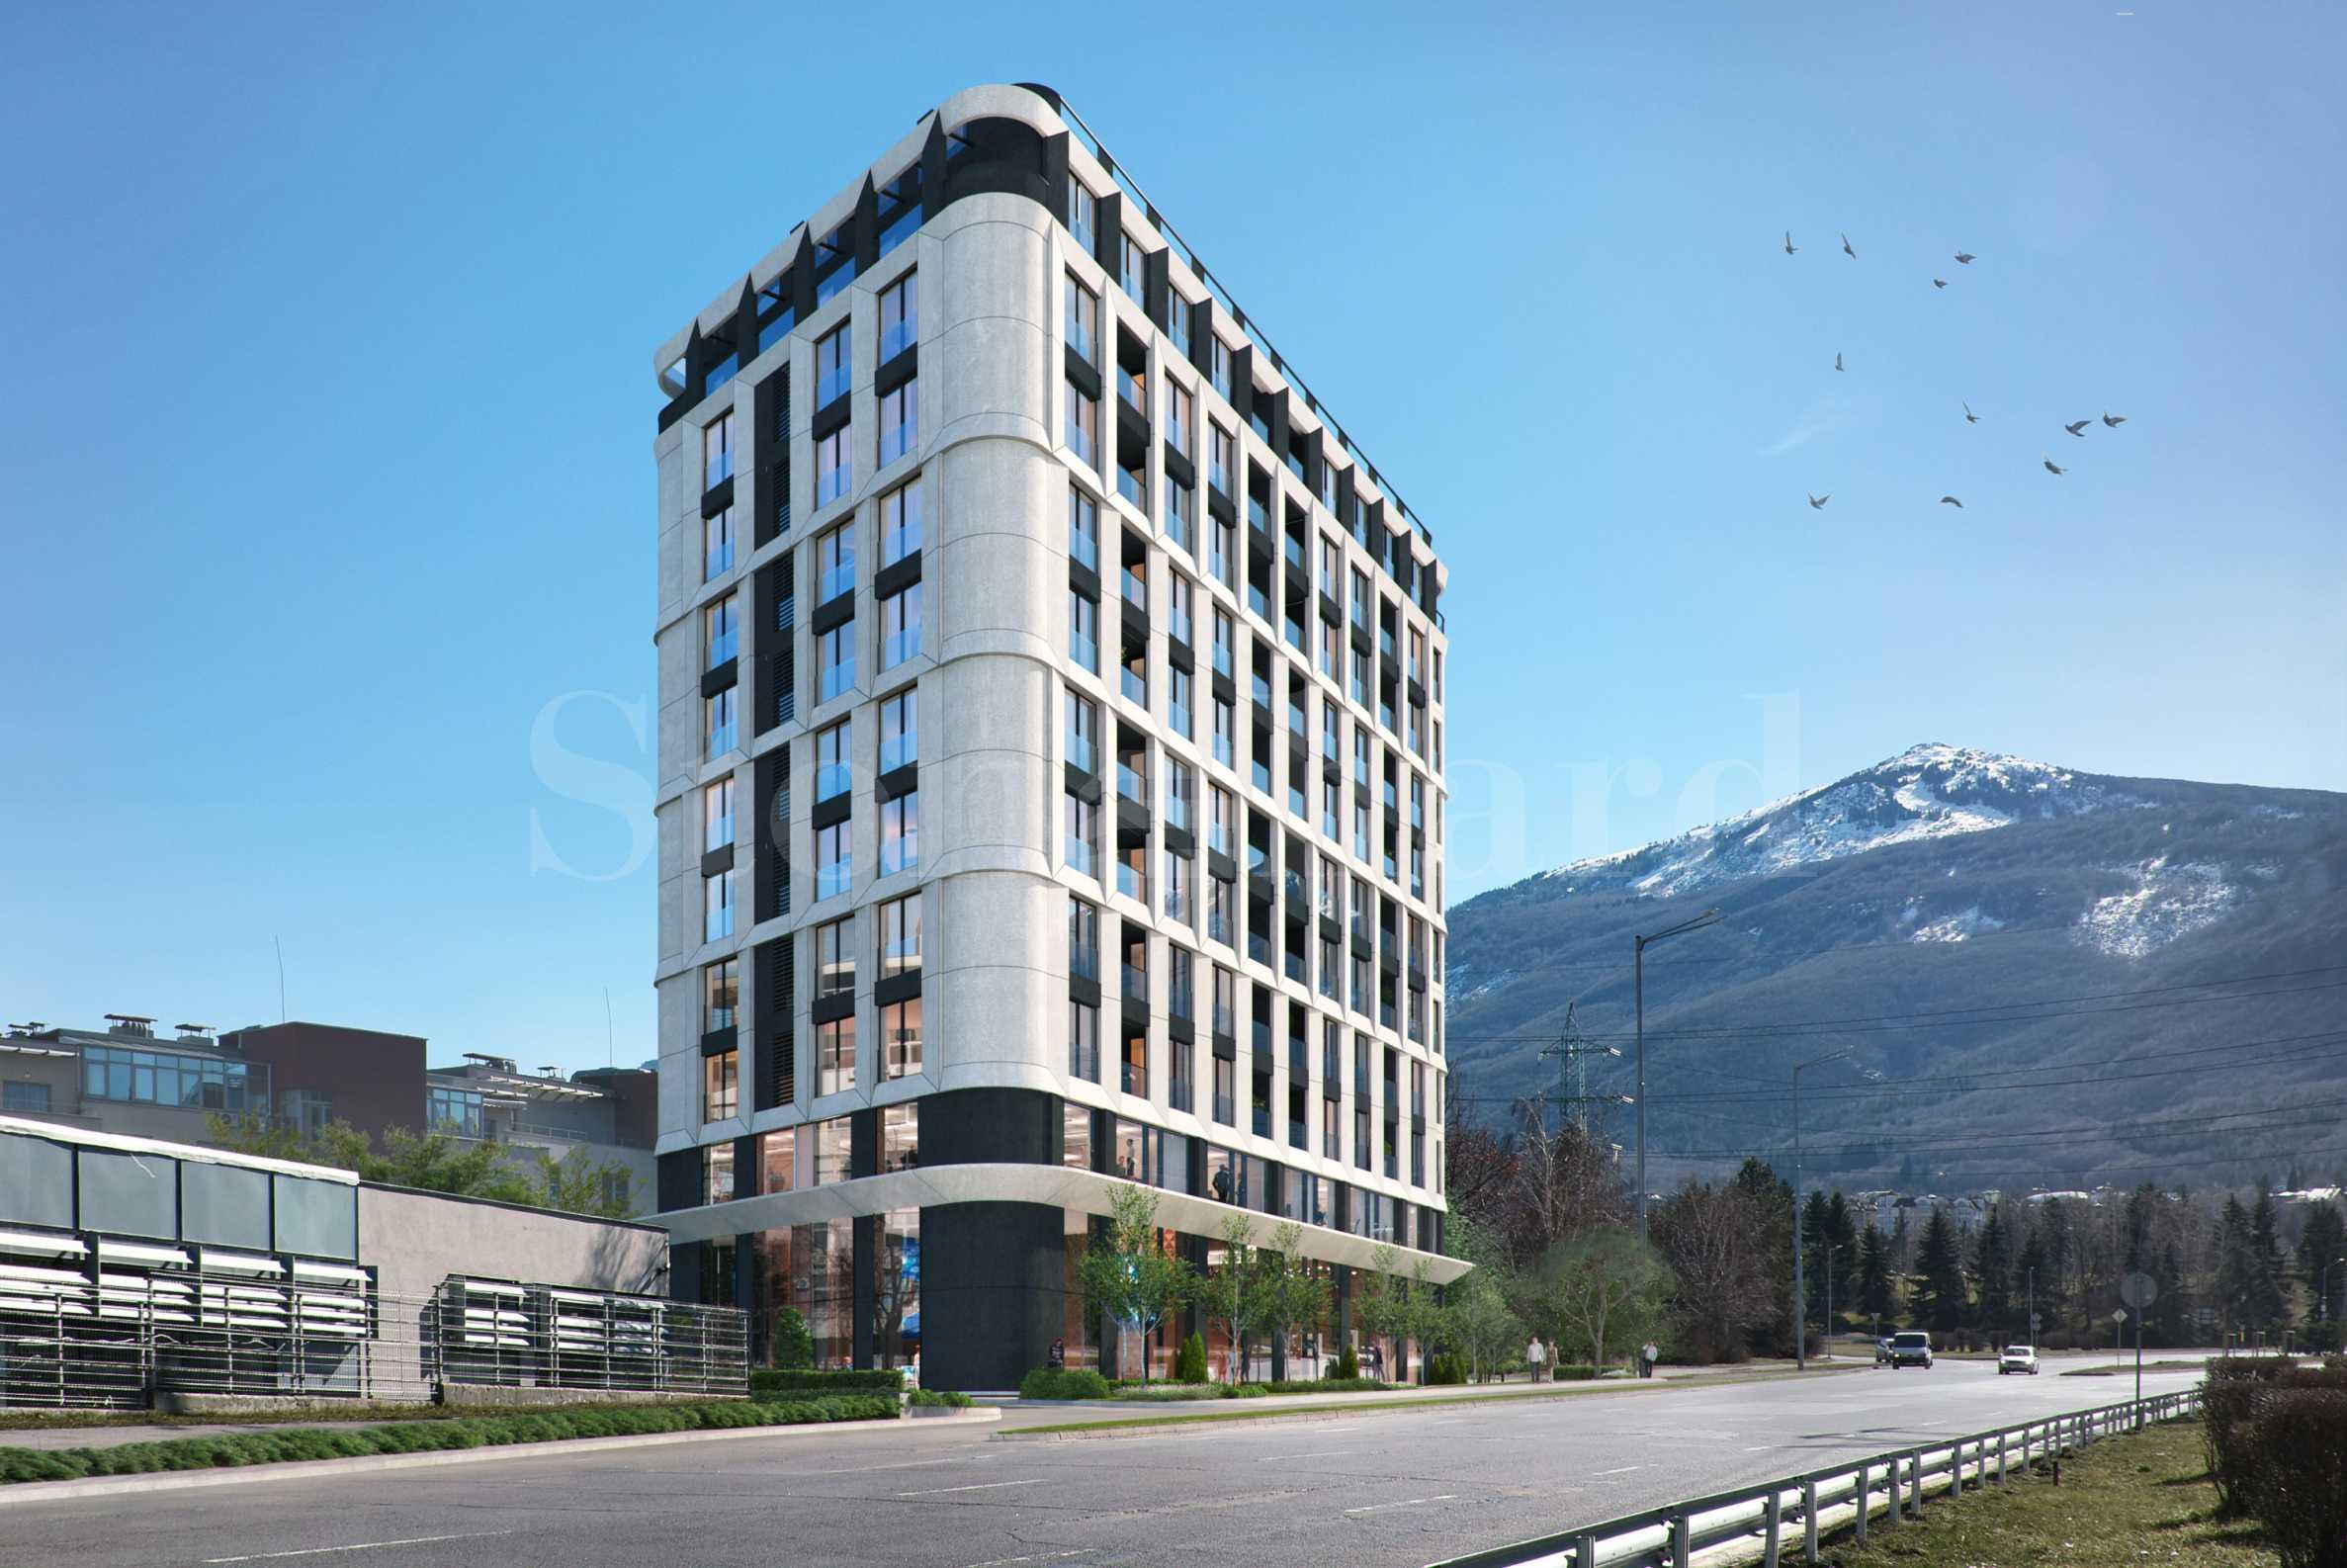 Via Bulgaria: Луксозна нова сграда на бул. България1 - Stonehard